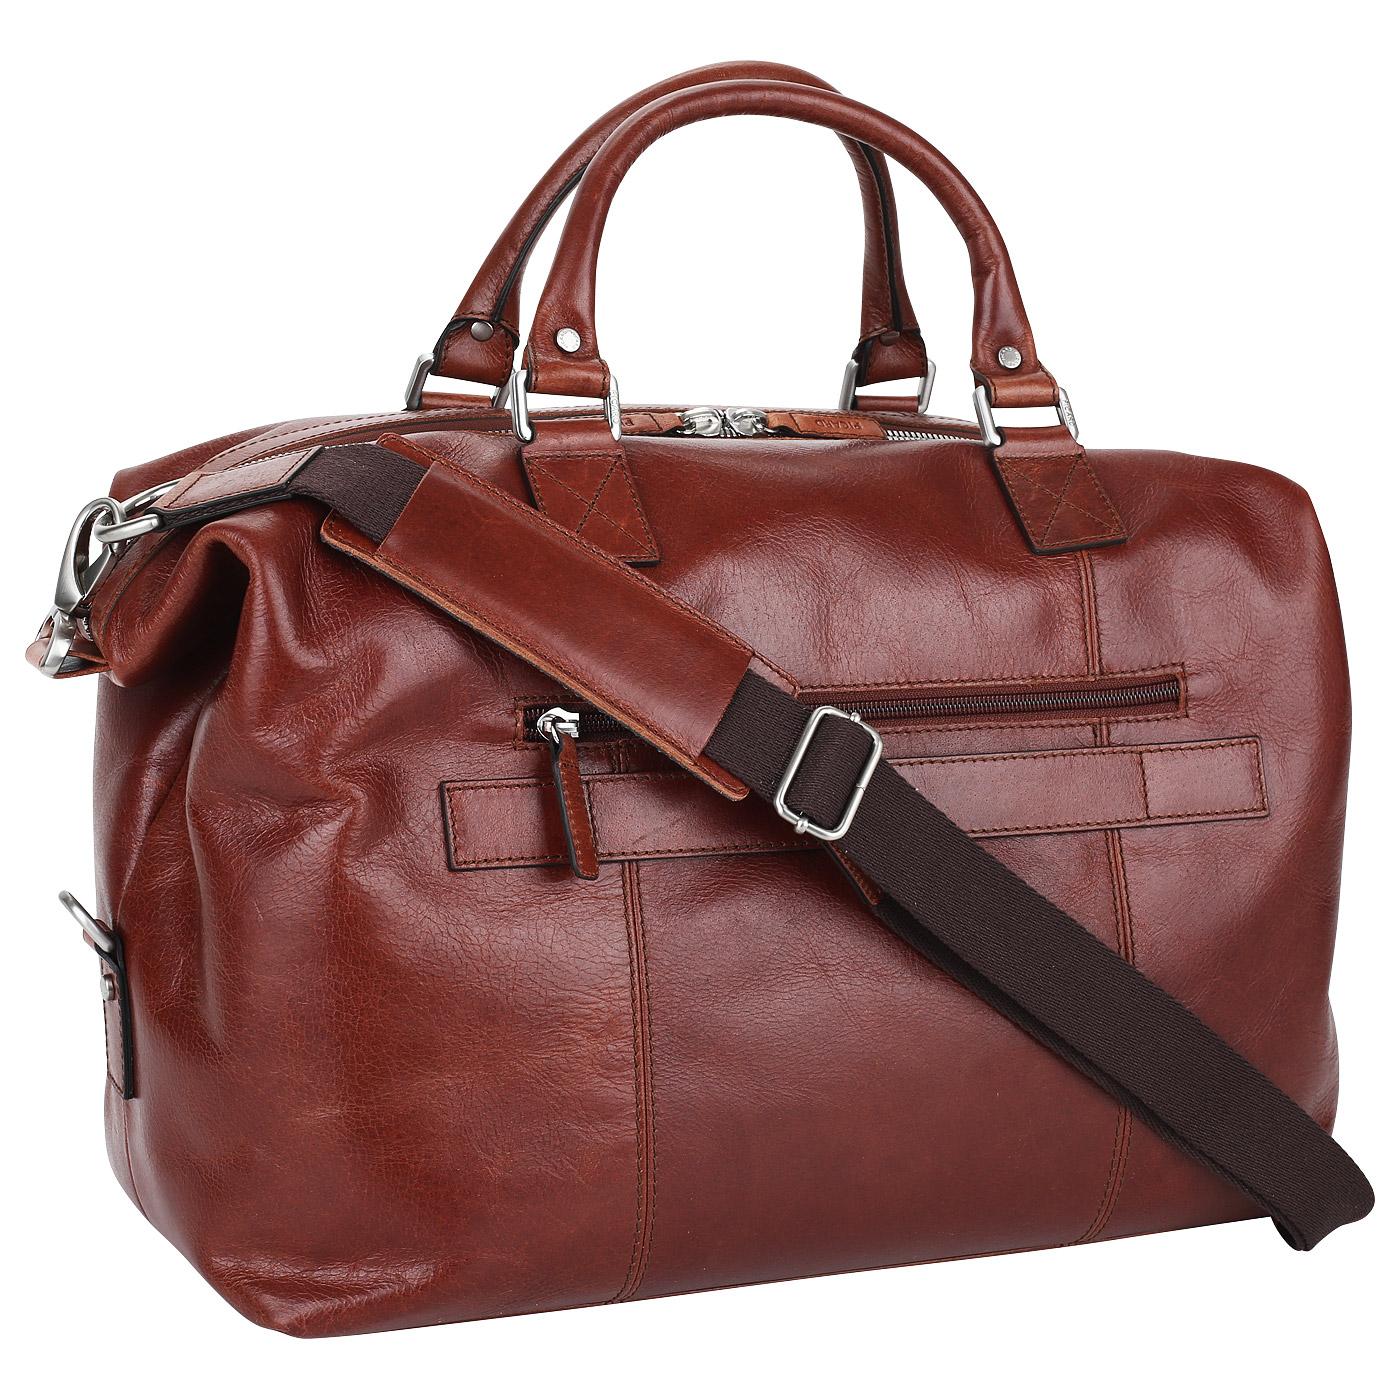 cee087c88e48 Дорожная сумка Picard Buddy 4235 51B cognac - 2000557723788 ...